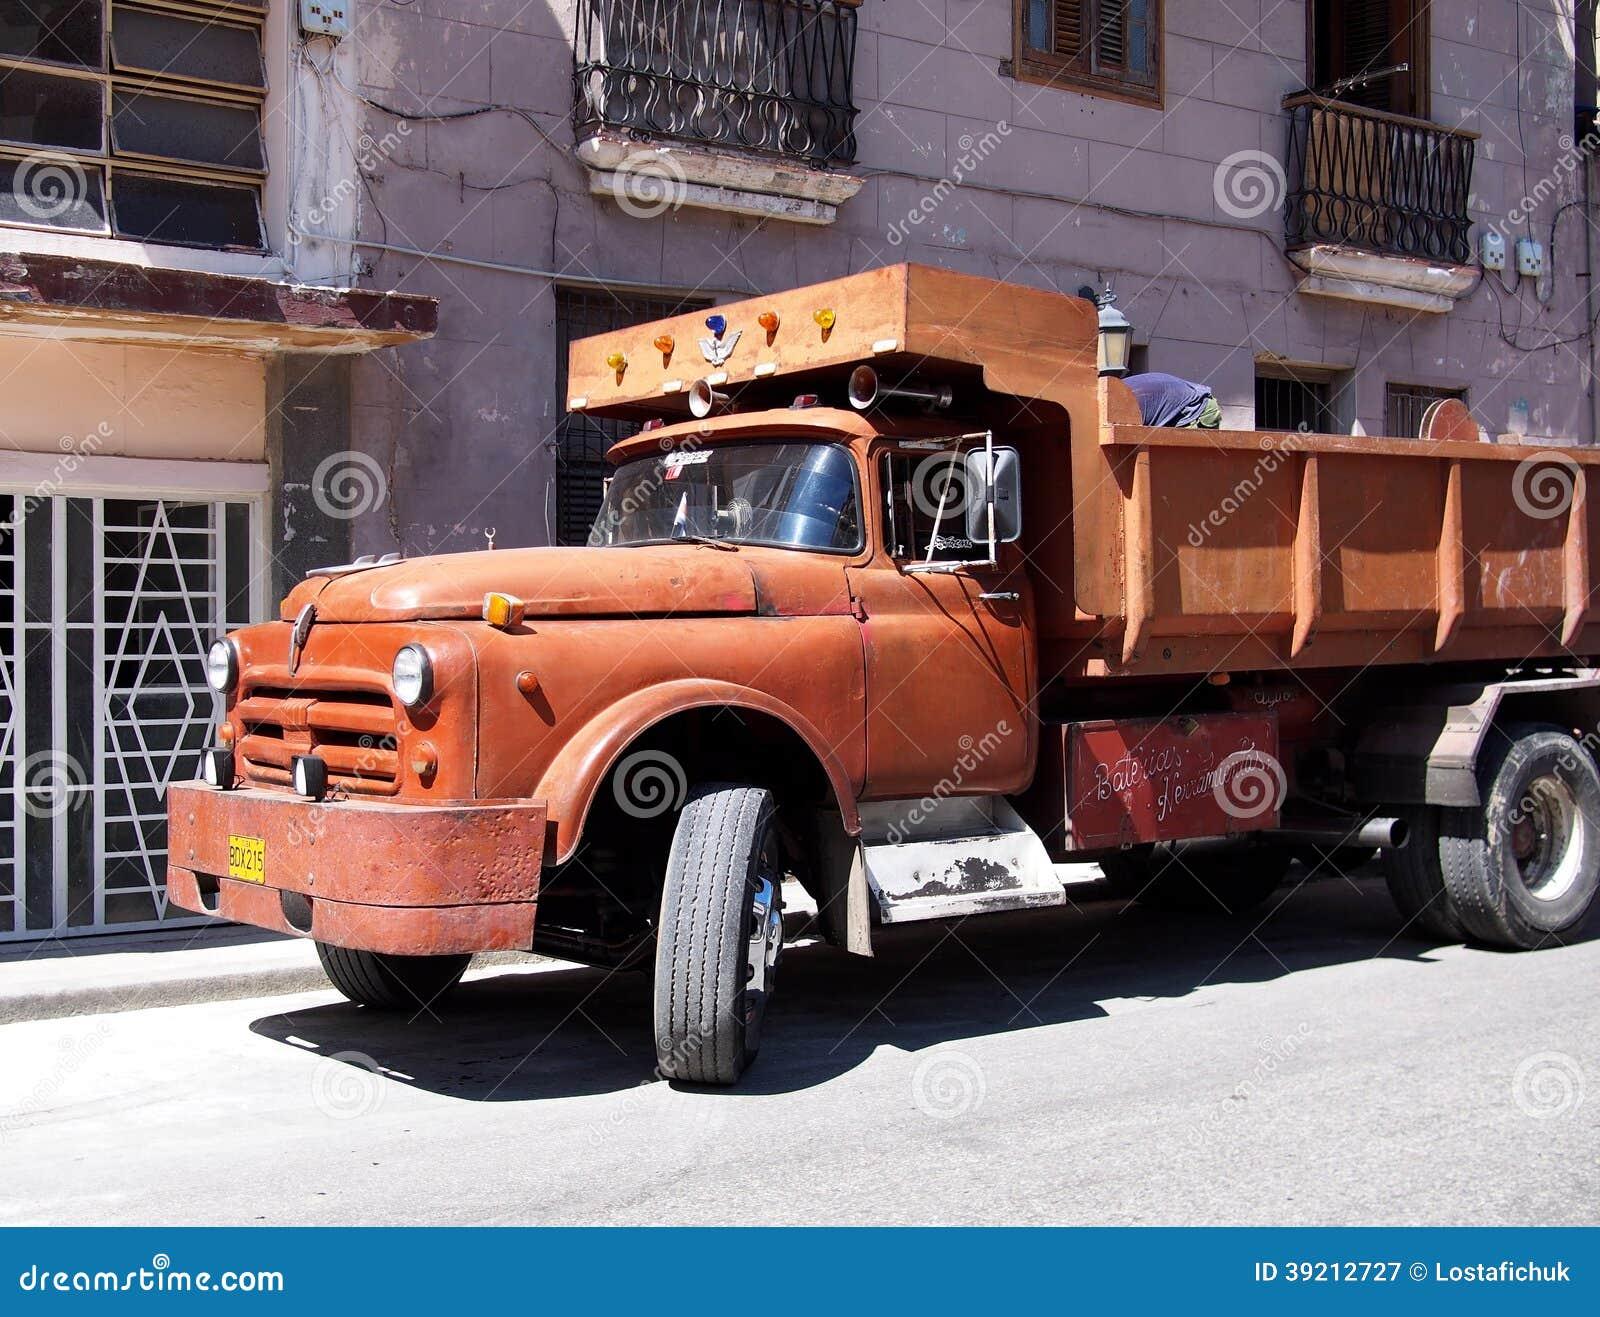 Trucks Of Cuba Editorial Photography Image 39212727